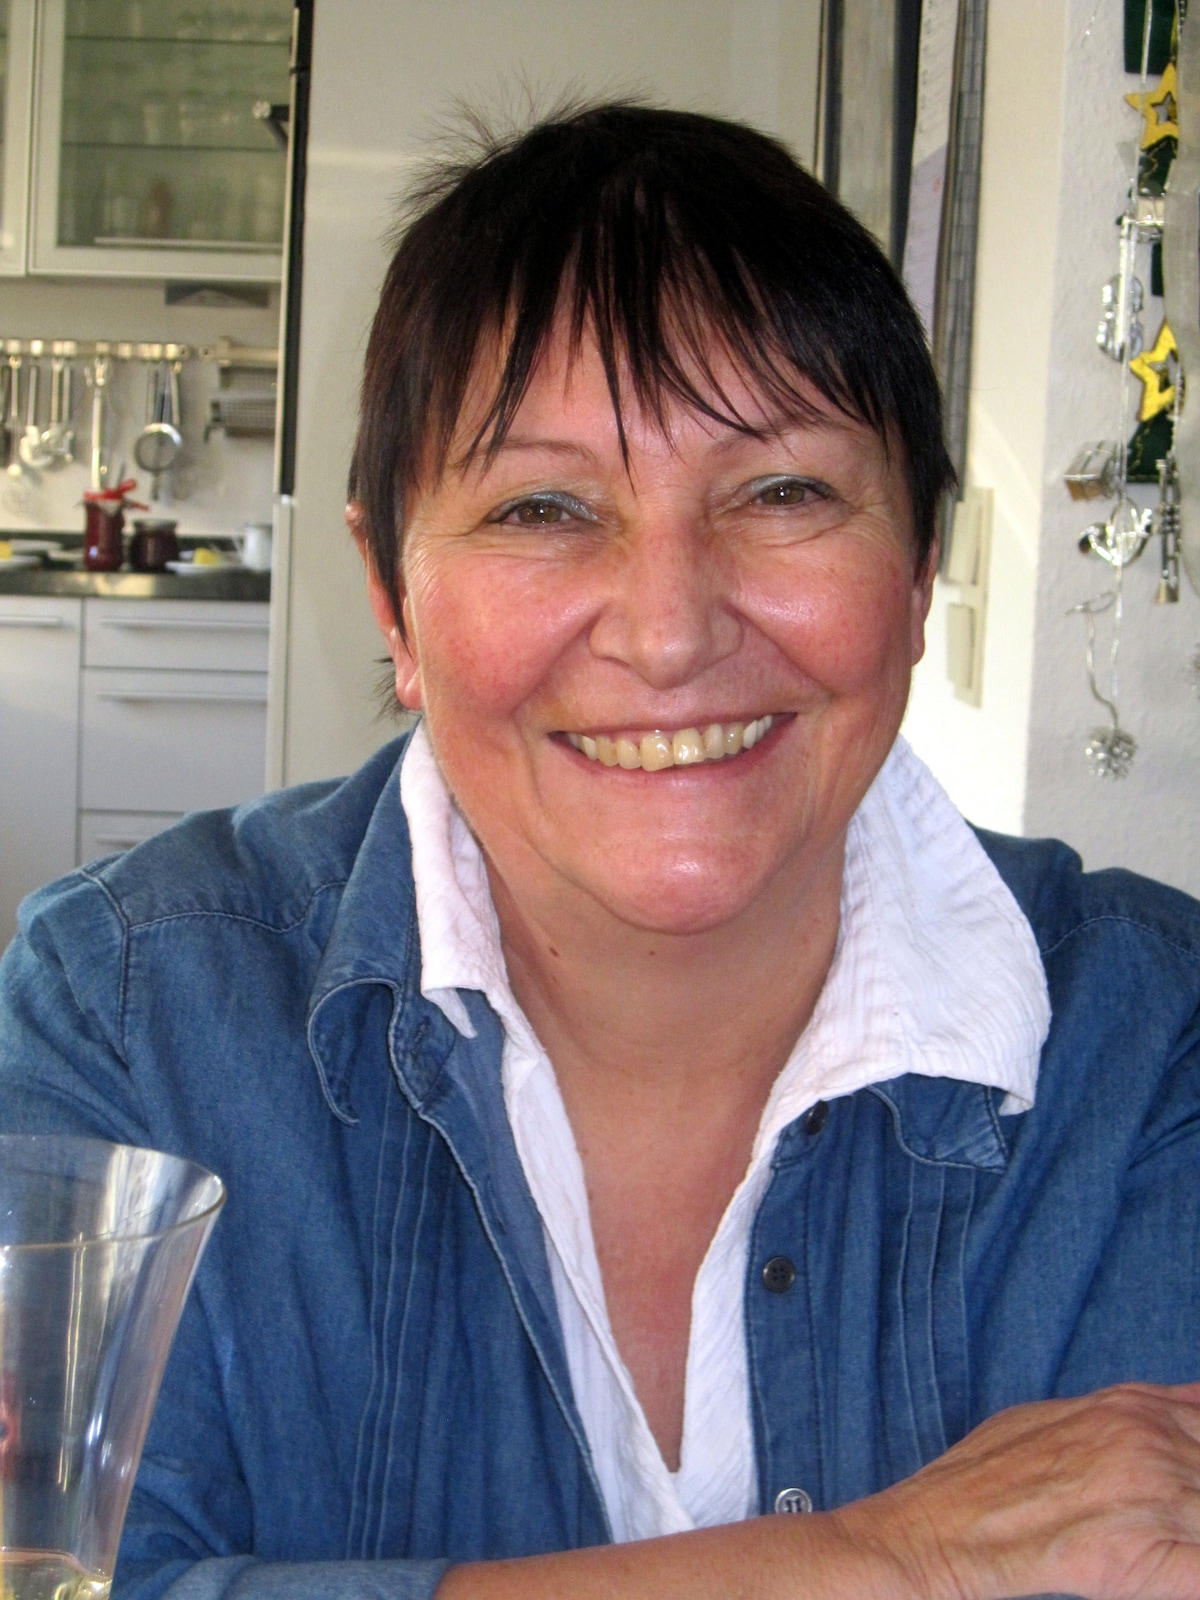 Karin from Neuss